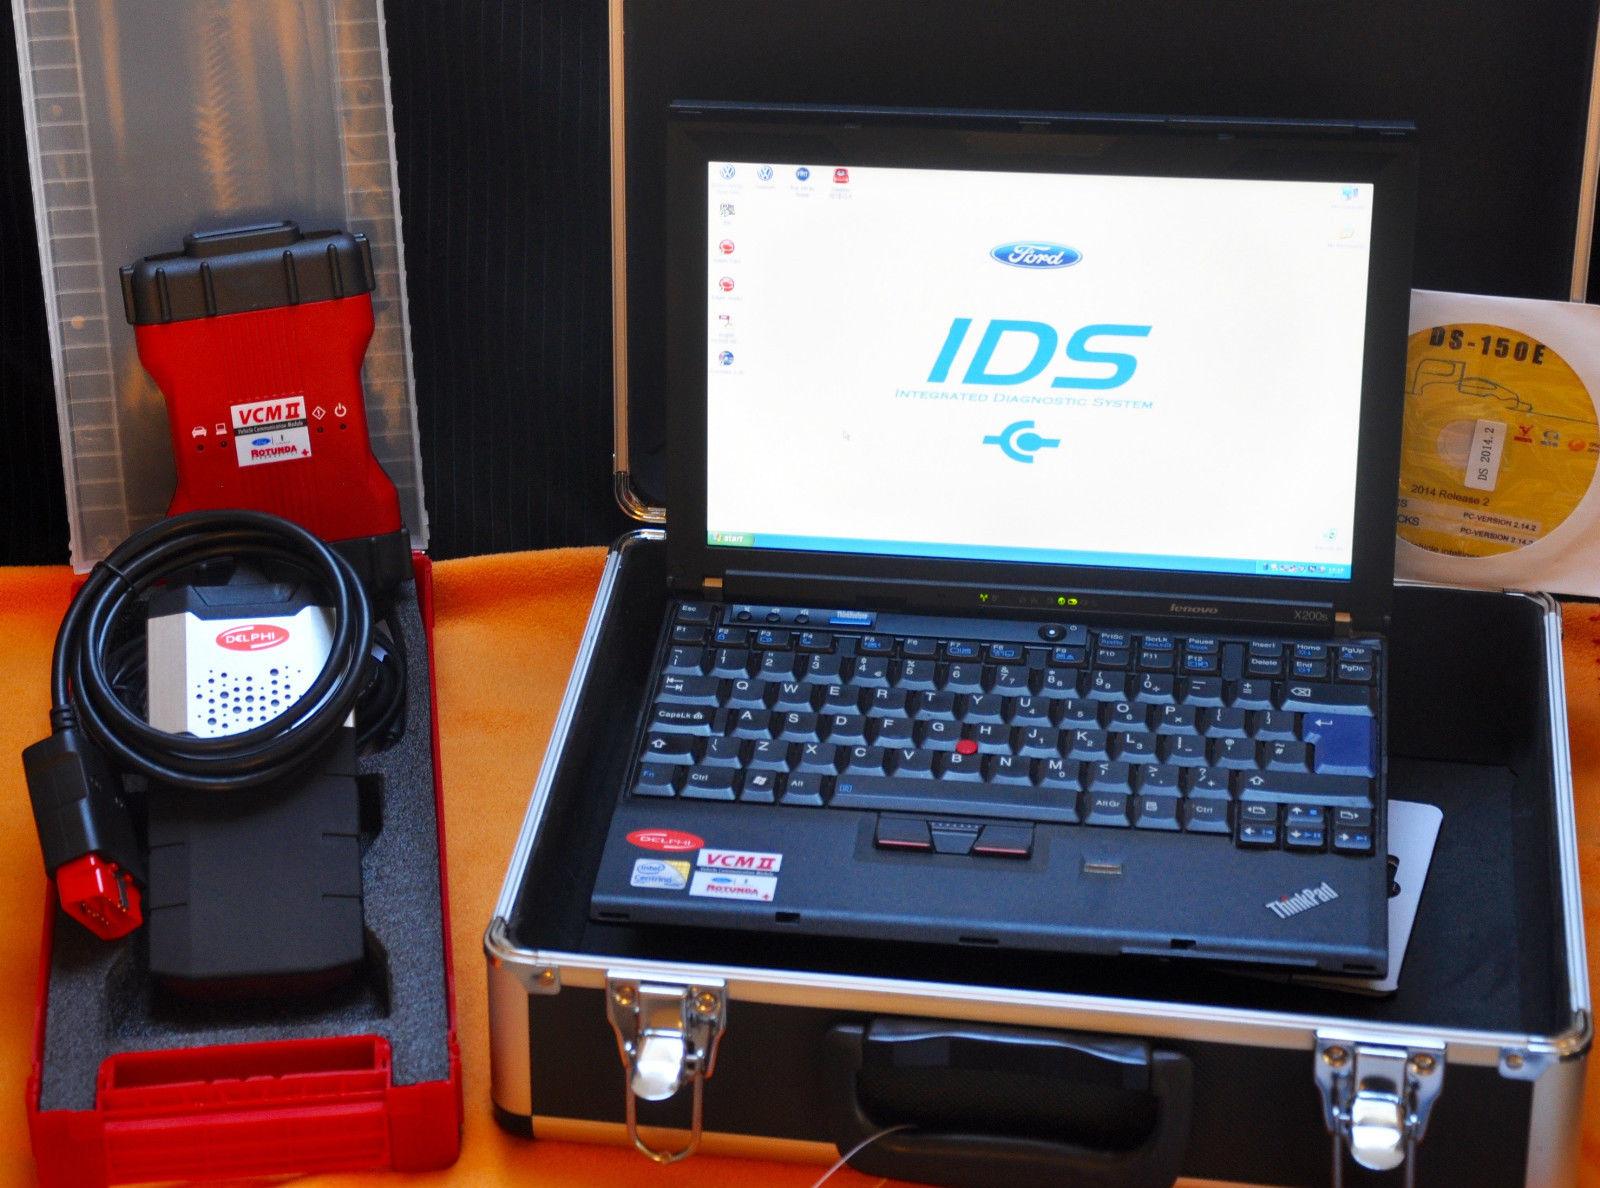 full auto diagnostic laptop with ford vcm dealer level ids. Black Bedroom Furniture Sets. Home Design Ideas